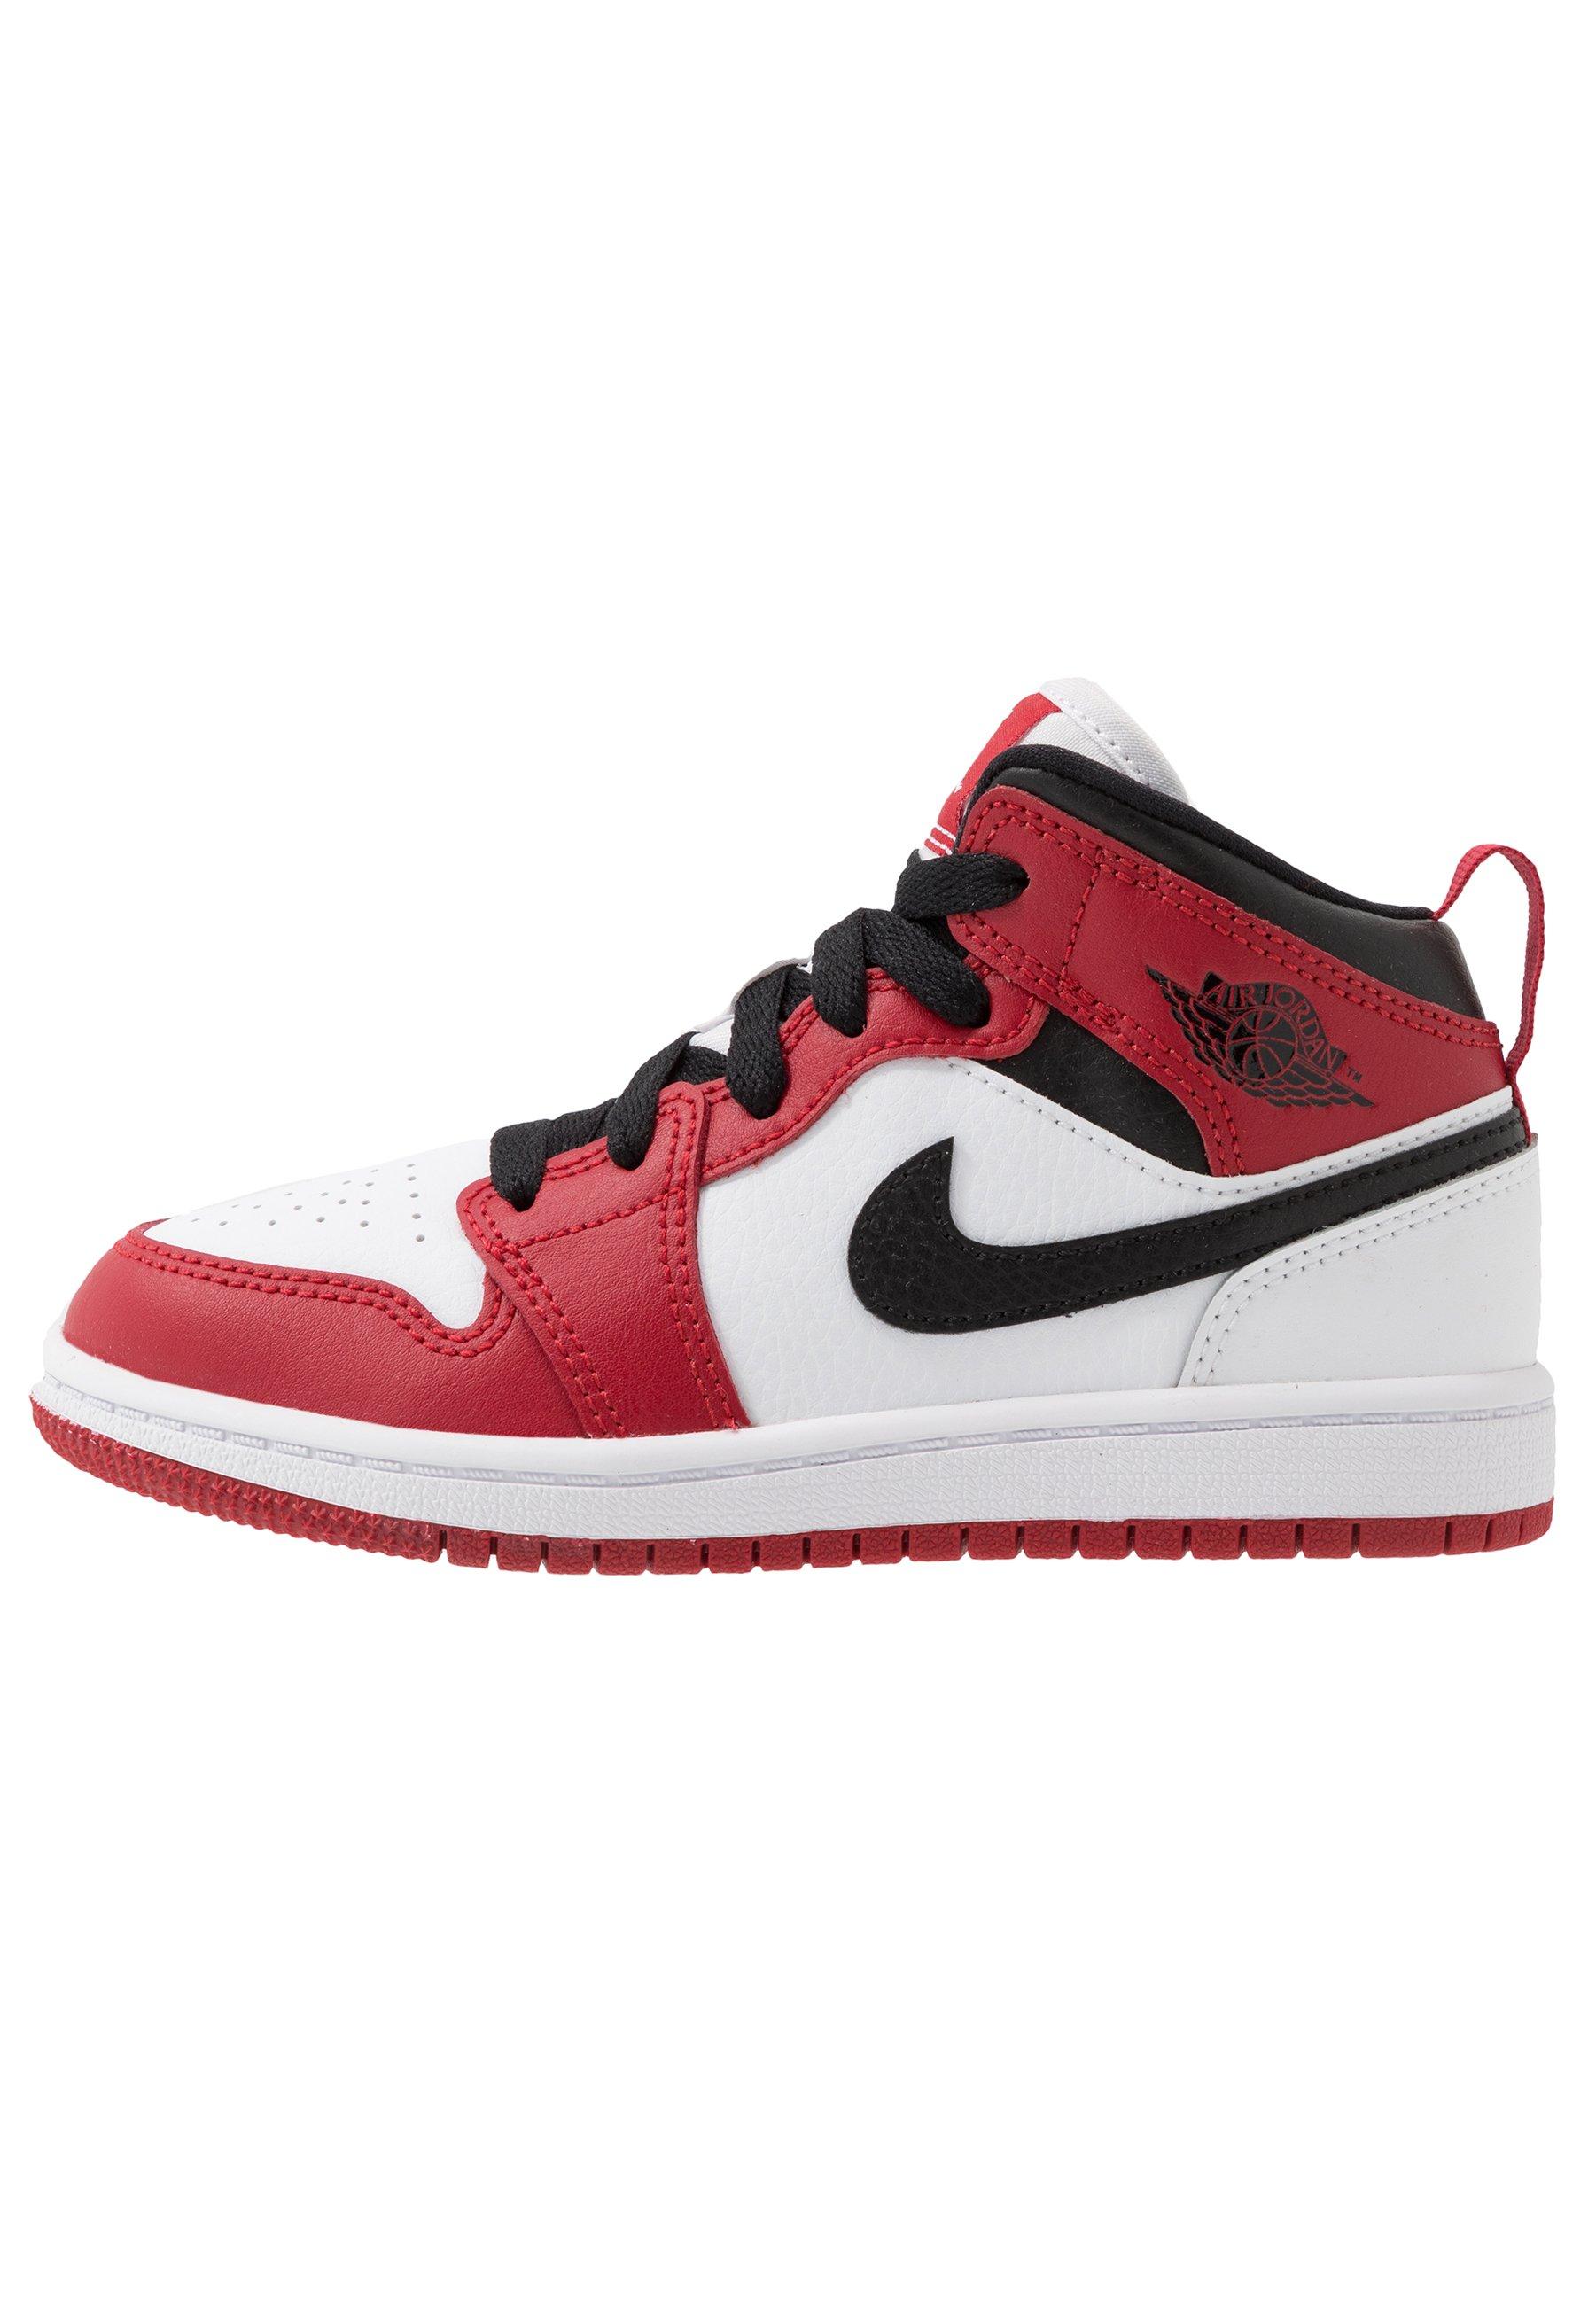 1 MID Basketbalschoenen whitegym redblack